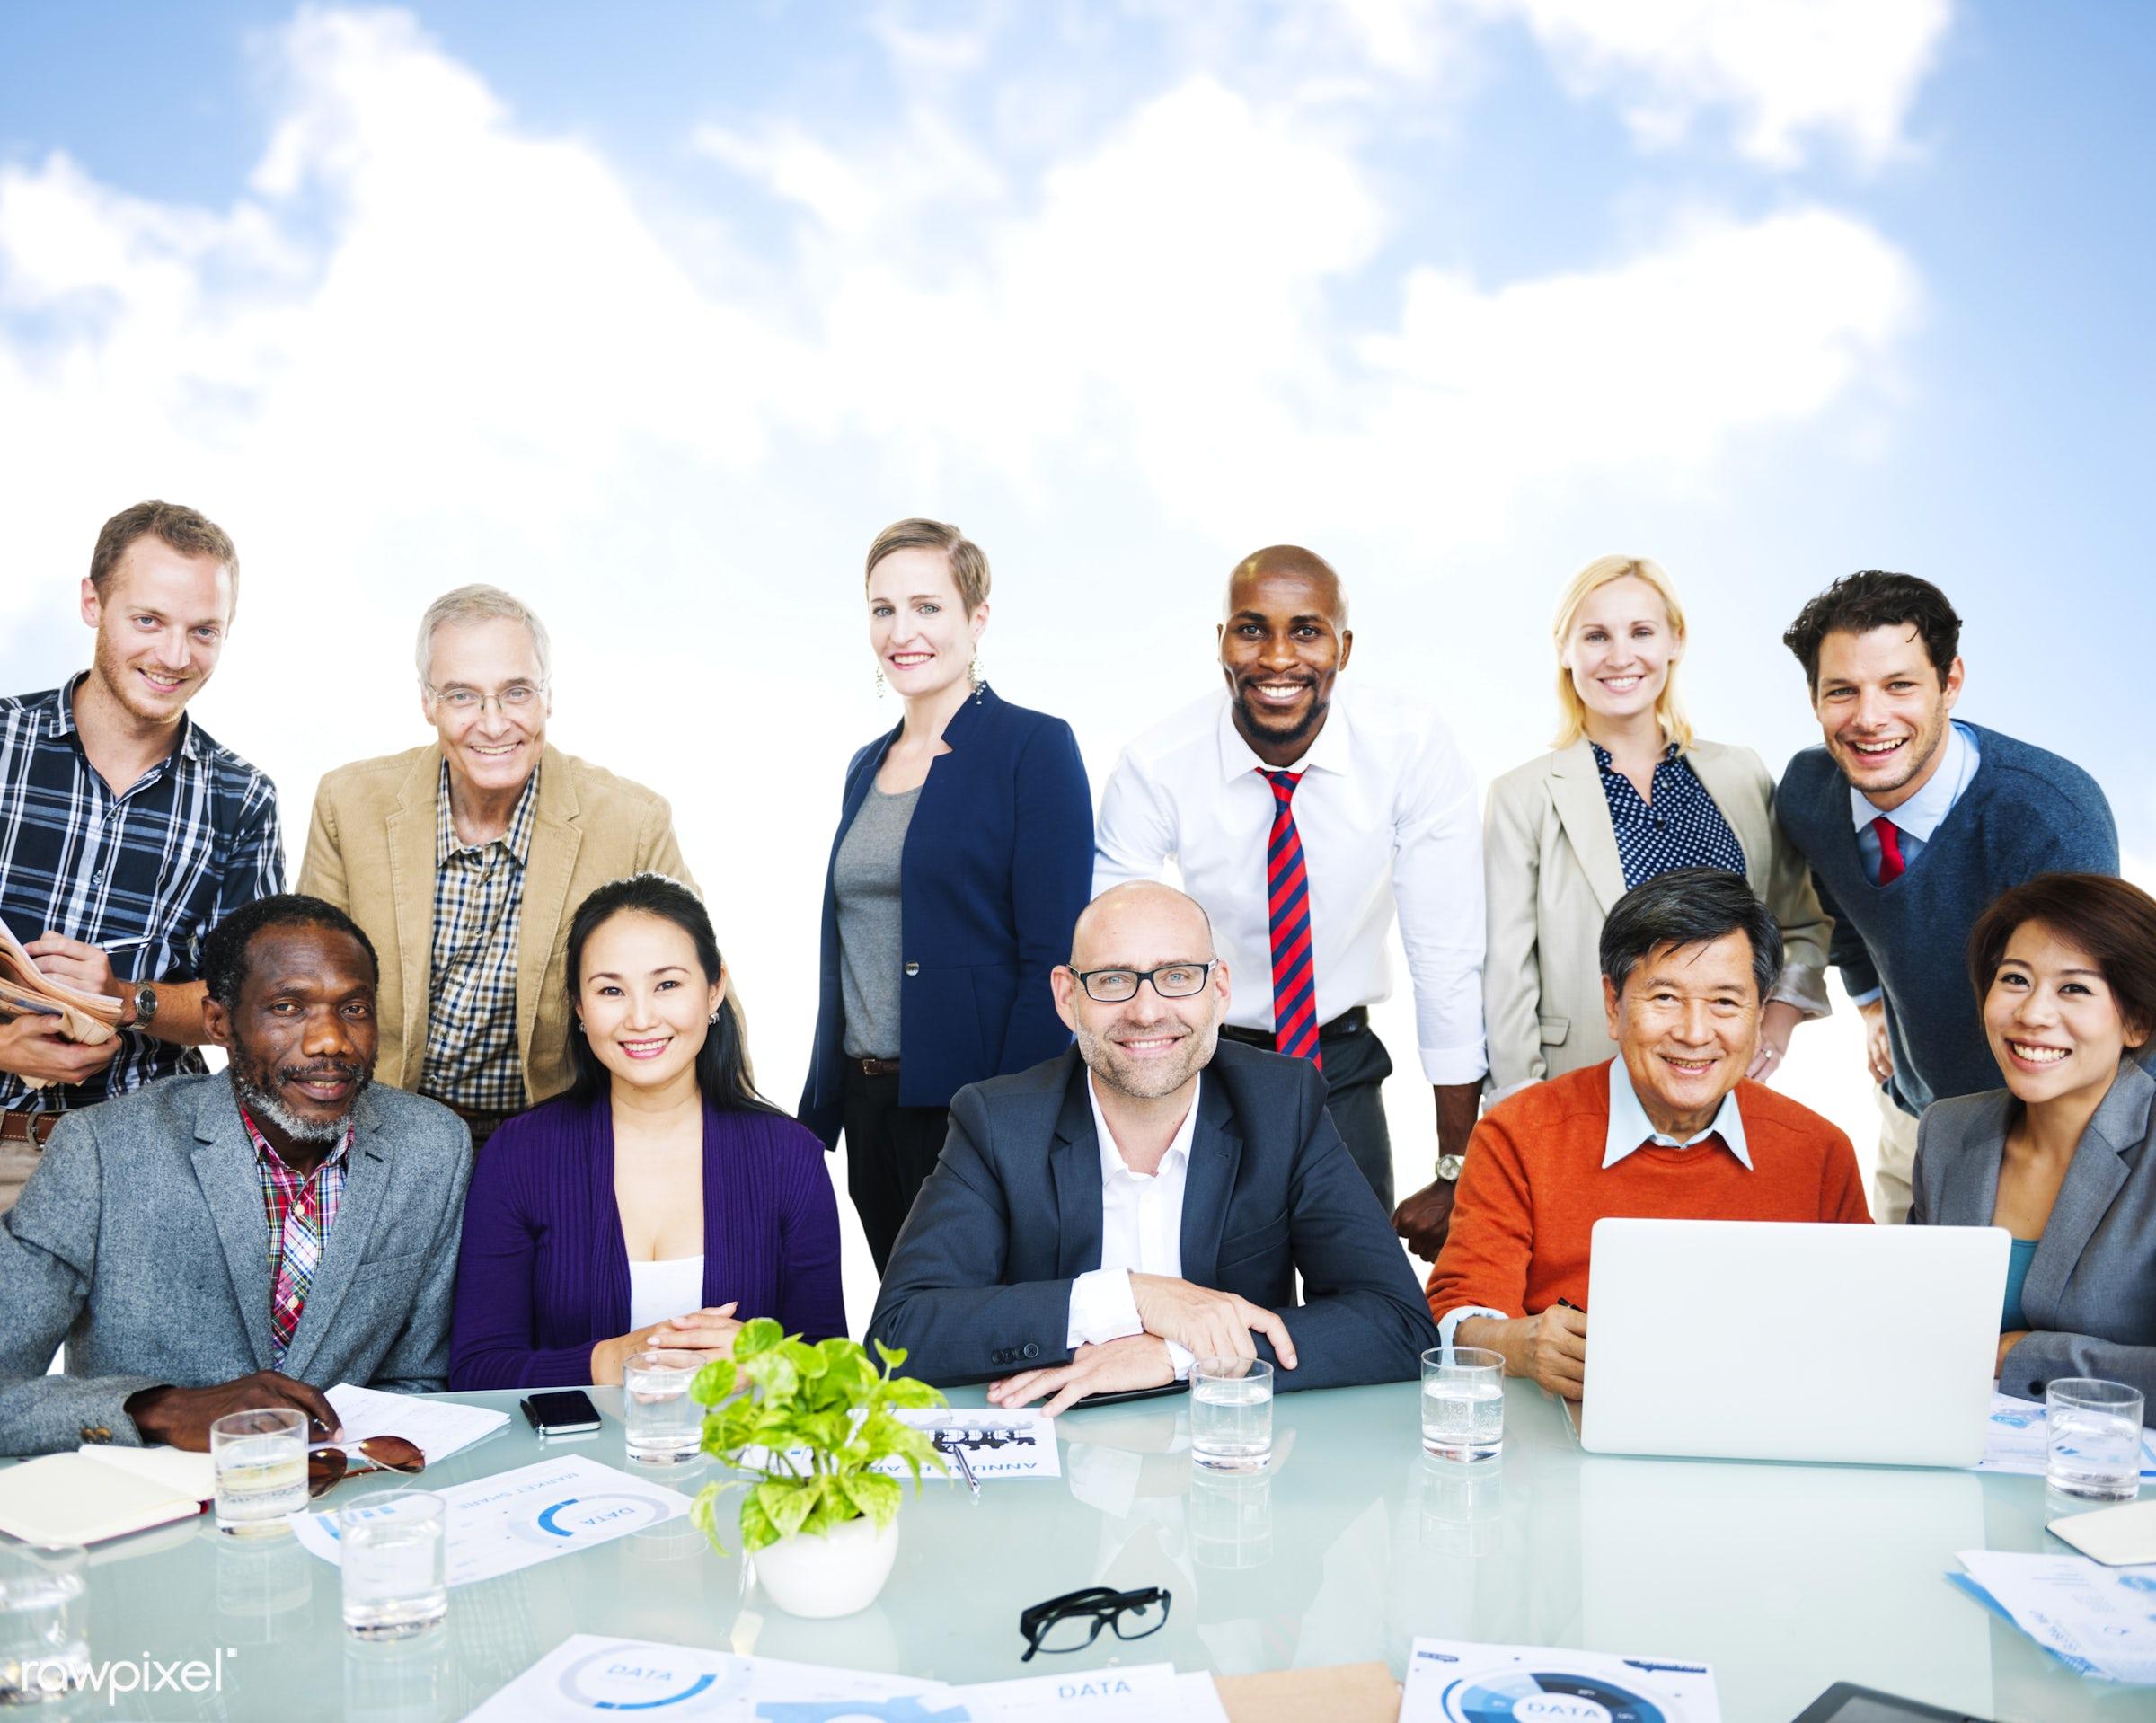 african descent, asian ethnicity, business, business people, businessmen, businesswomen, casual, clodscape, cloud,...